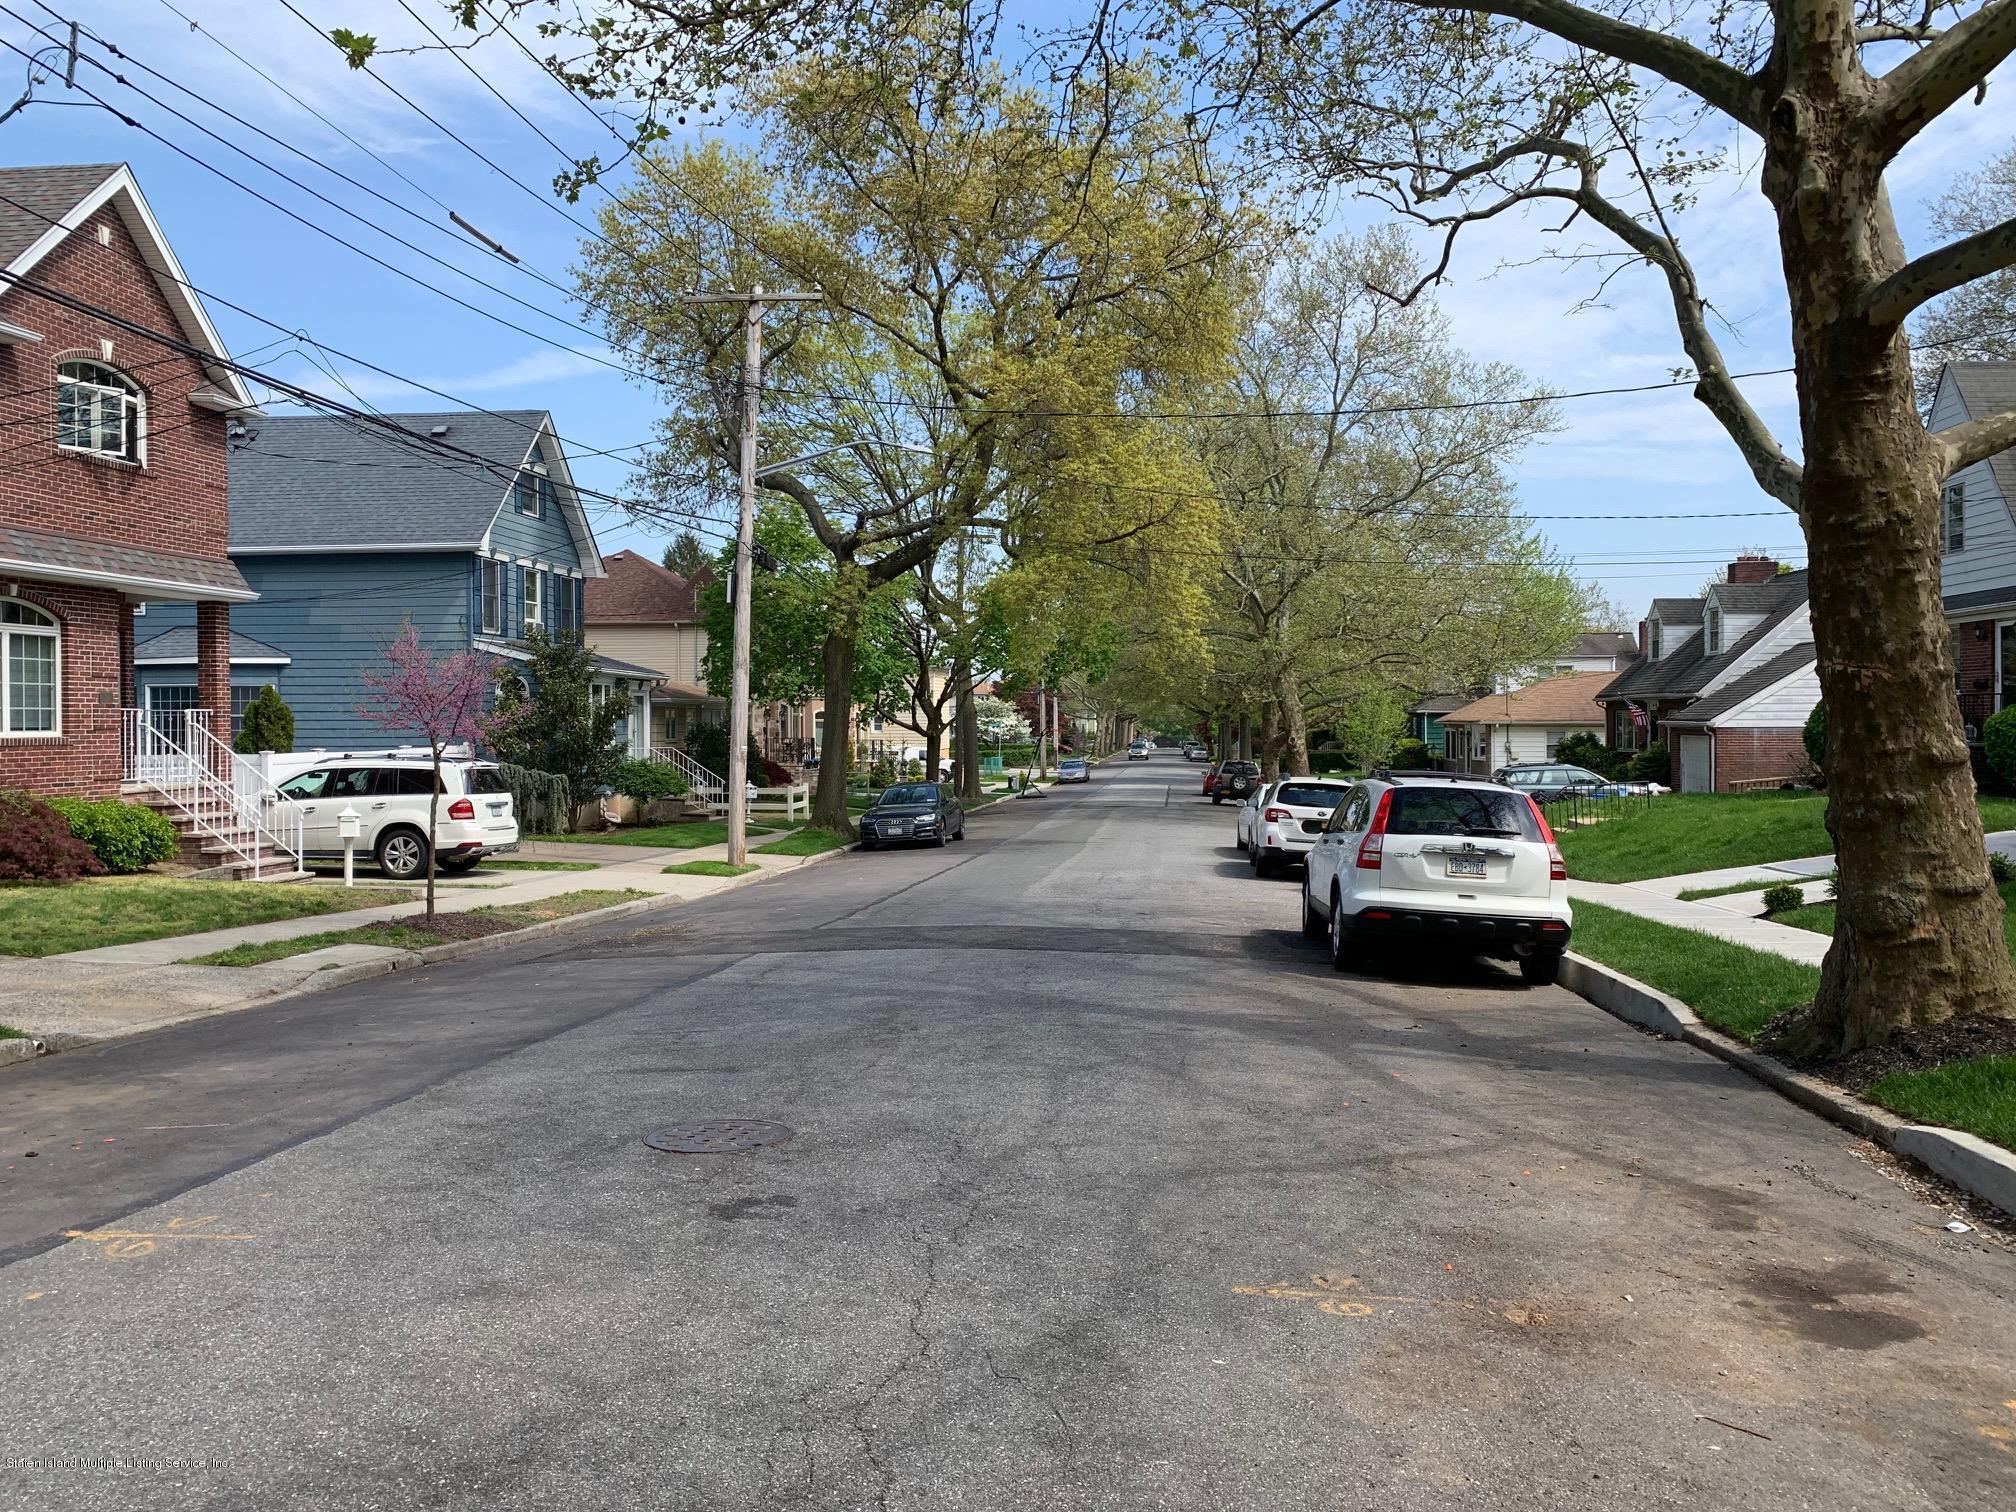 Two Family - Detached 30 Atlantic Avenue  Staten Island, NY 10304, MLS-1128623-59